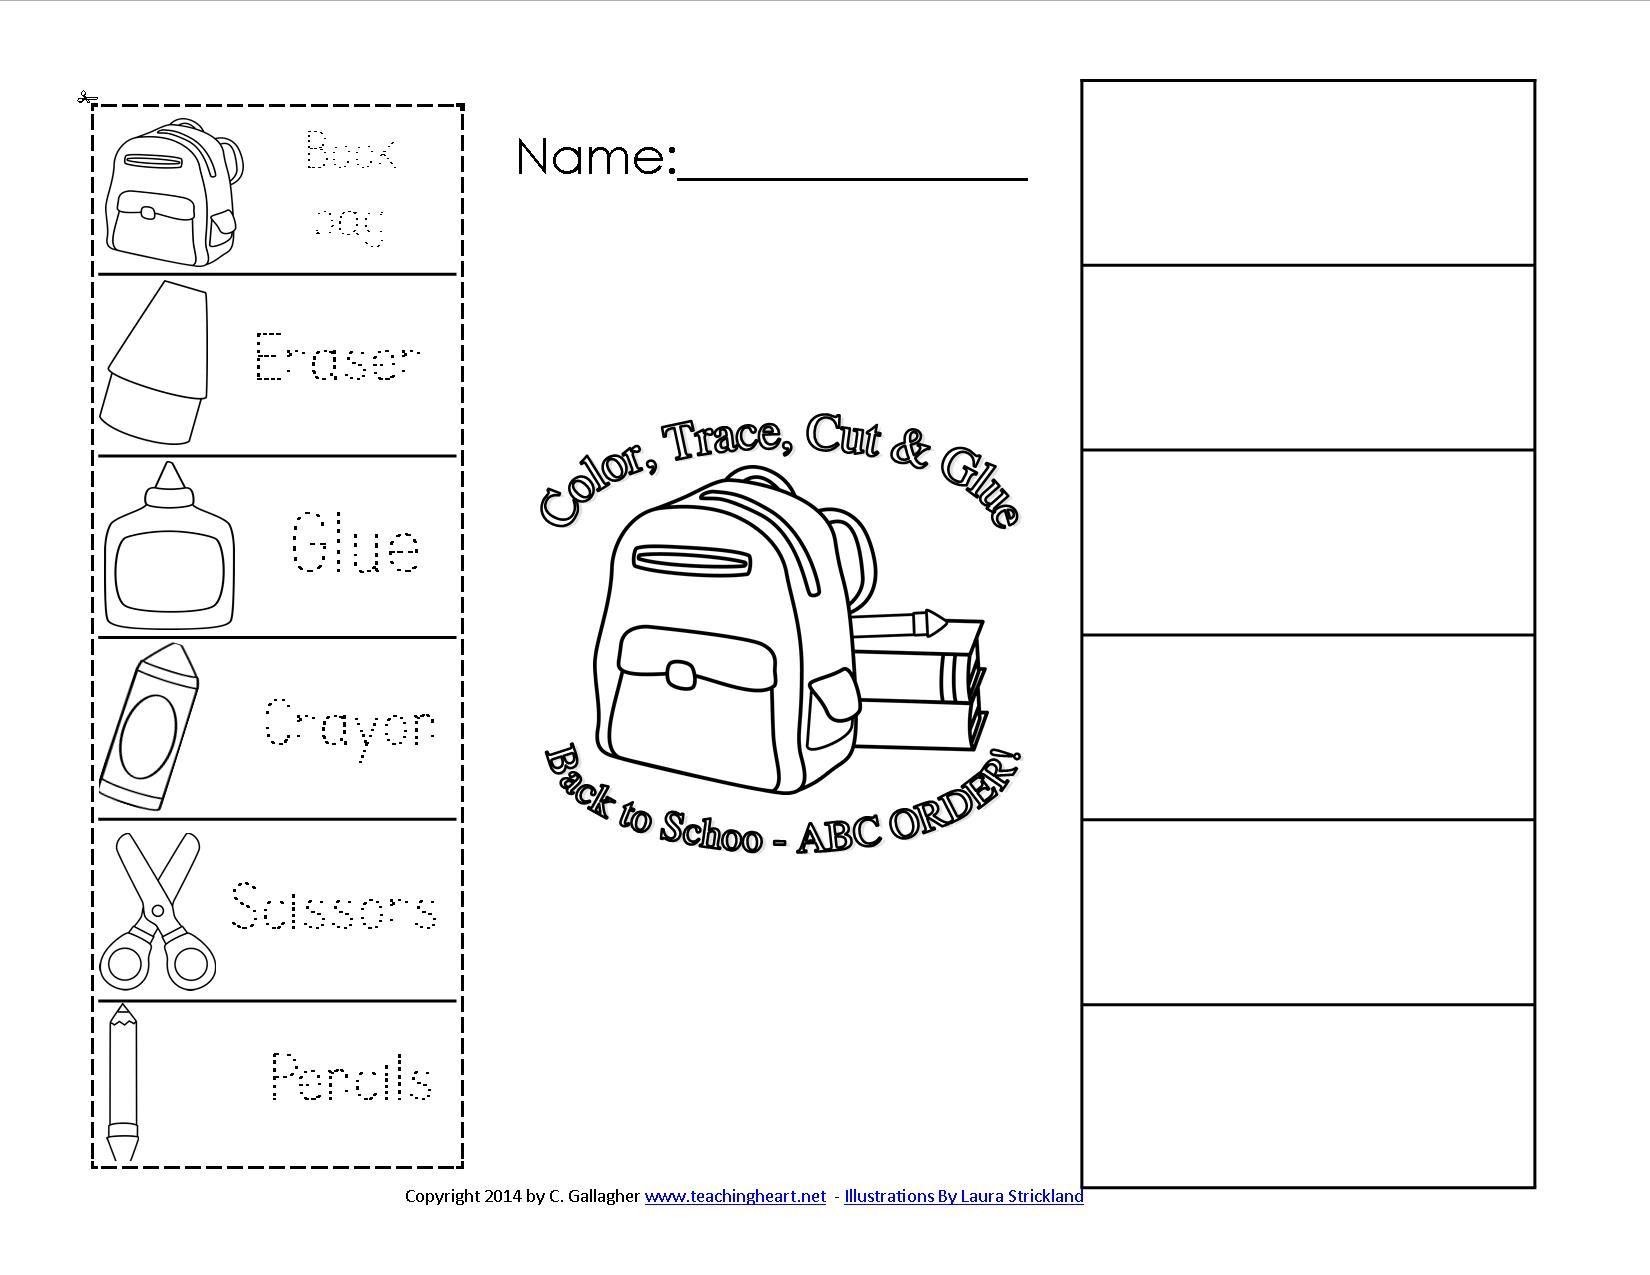 Back To School Abc Order Free To Print Teaching Heart Blog Abc Order Worksheet Kindergarten Worksheets Abc Order [ 1275 x 1650 Pixel ]